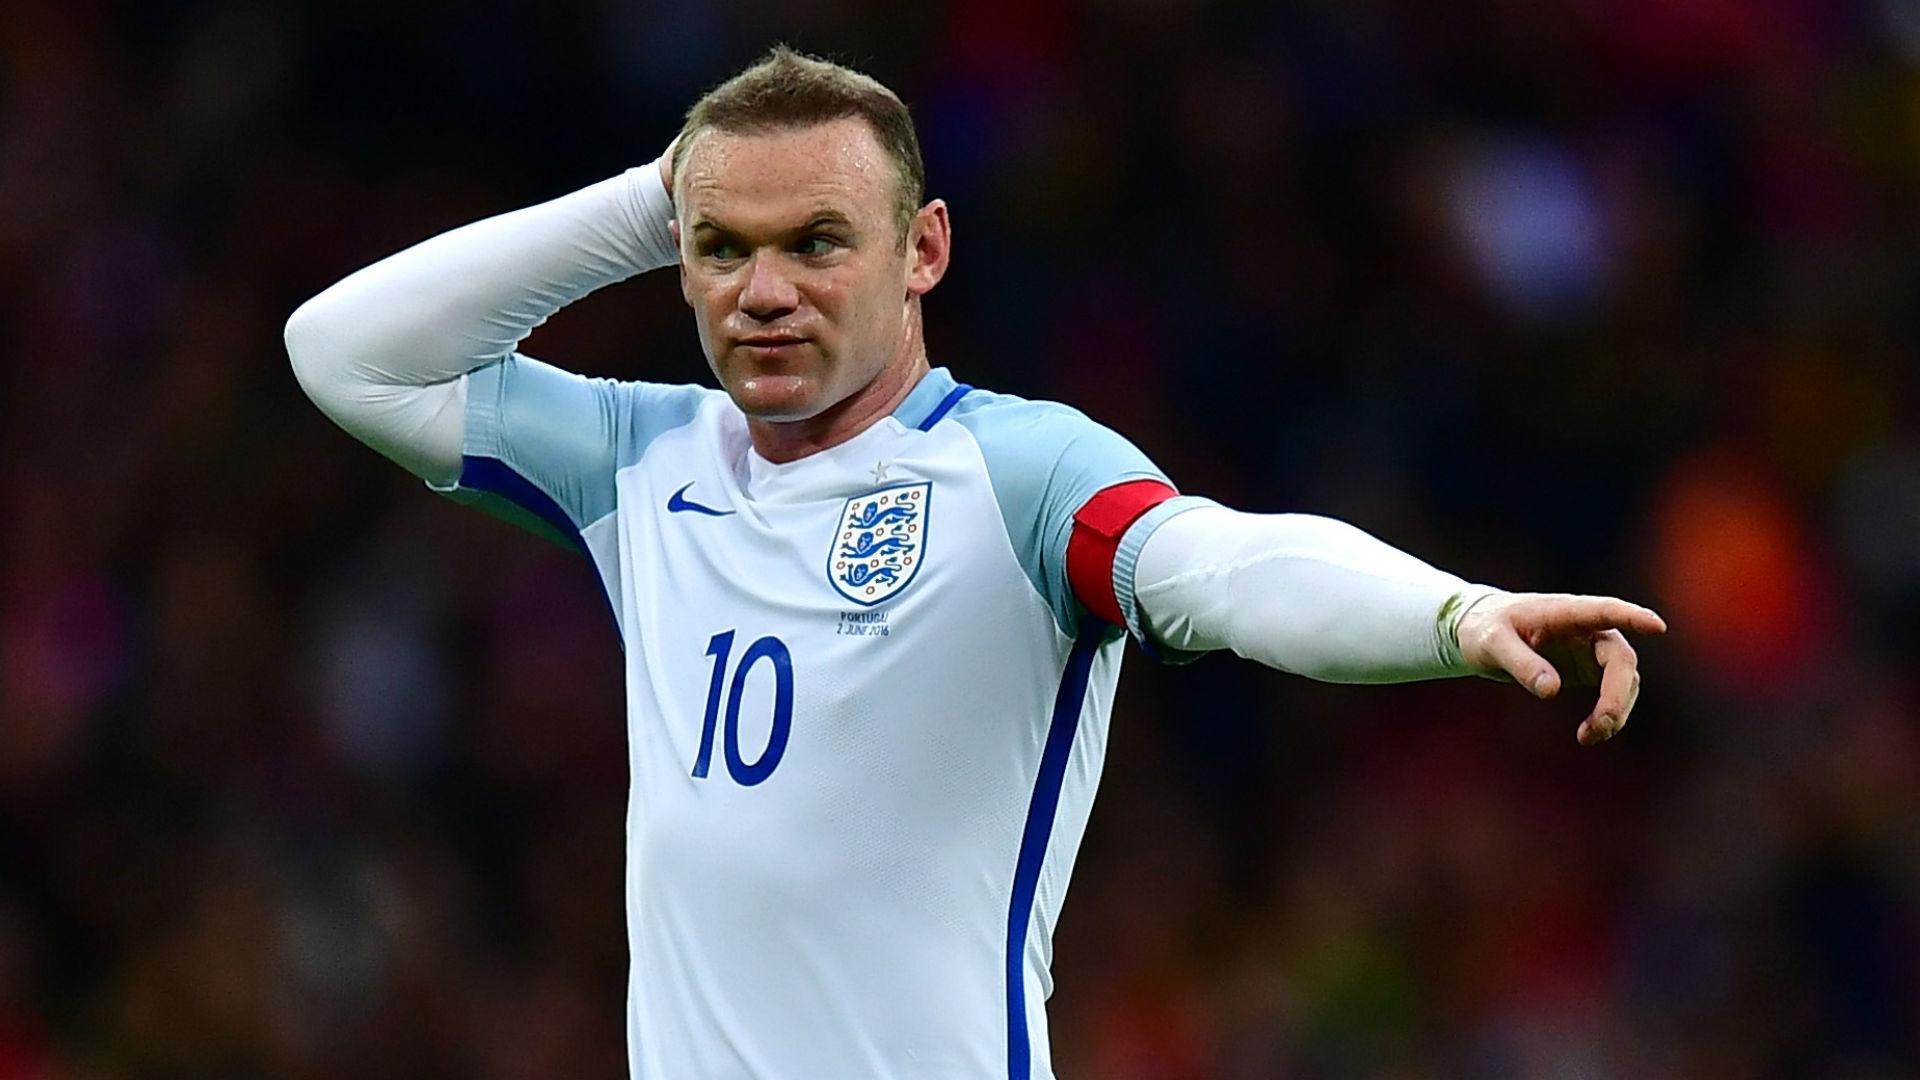 Rooney apologises for misbehaviour